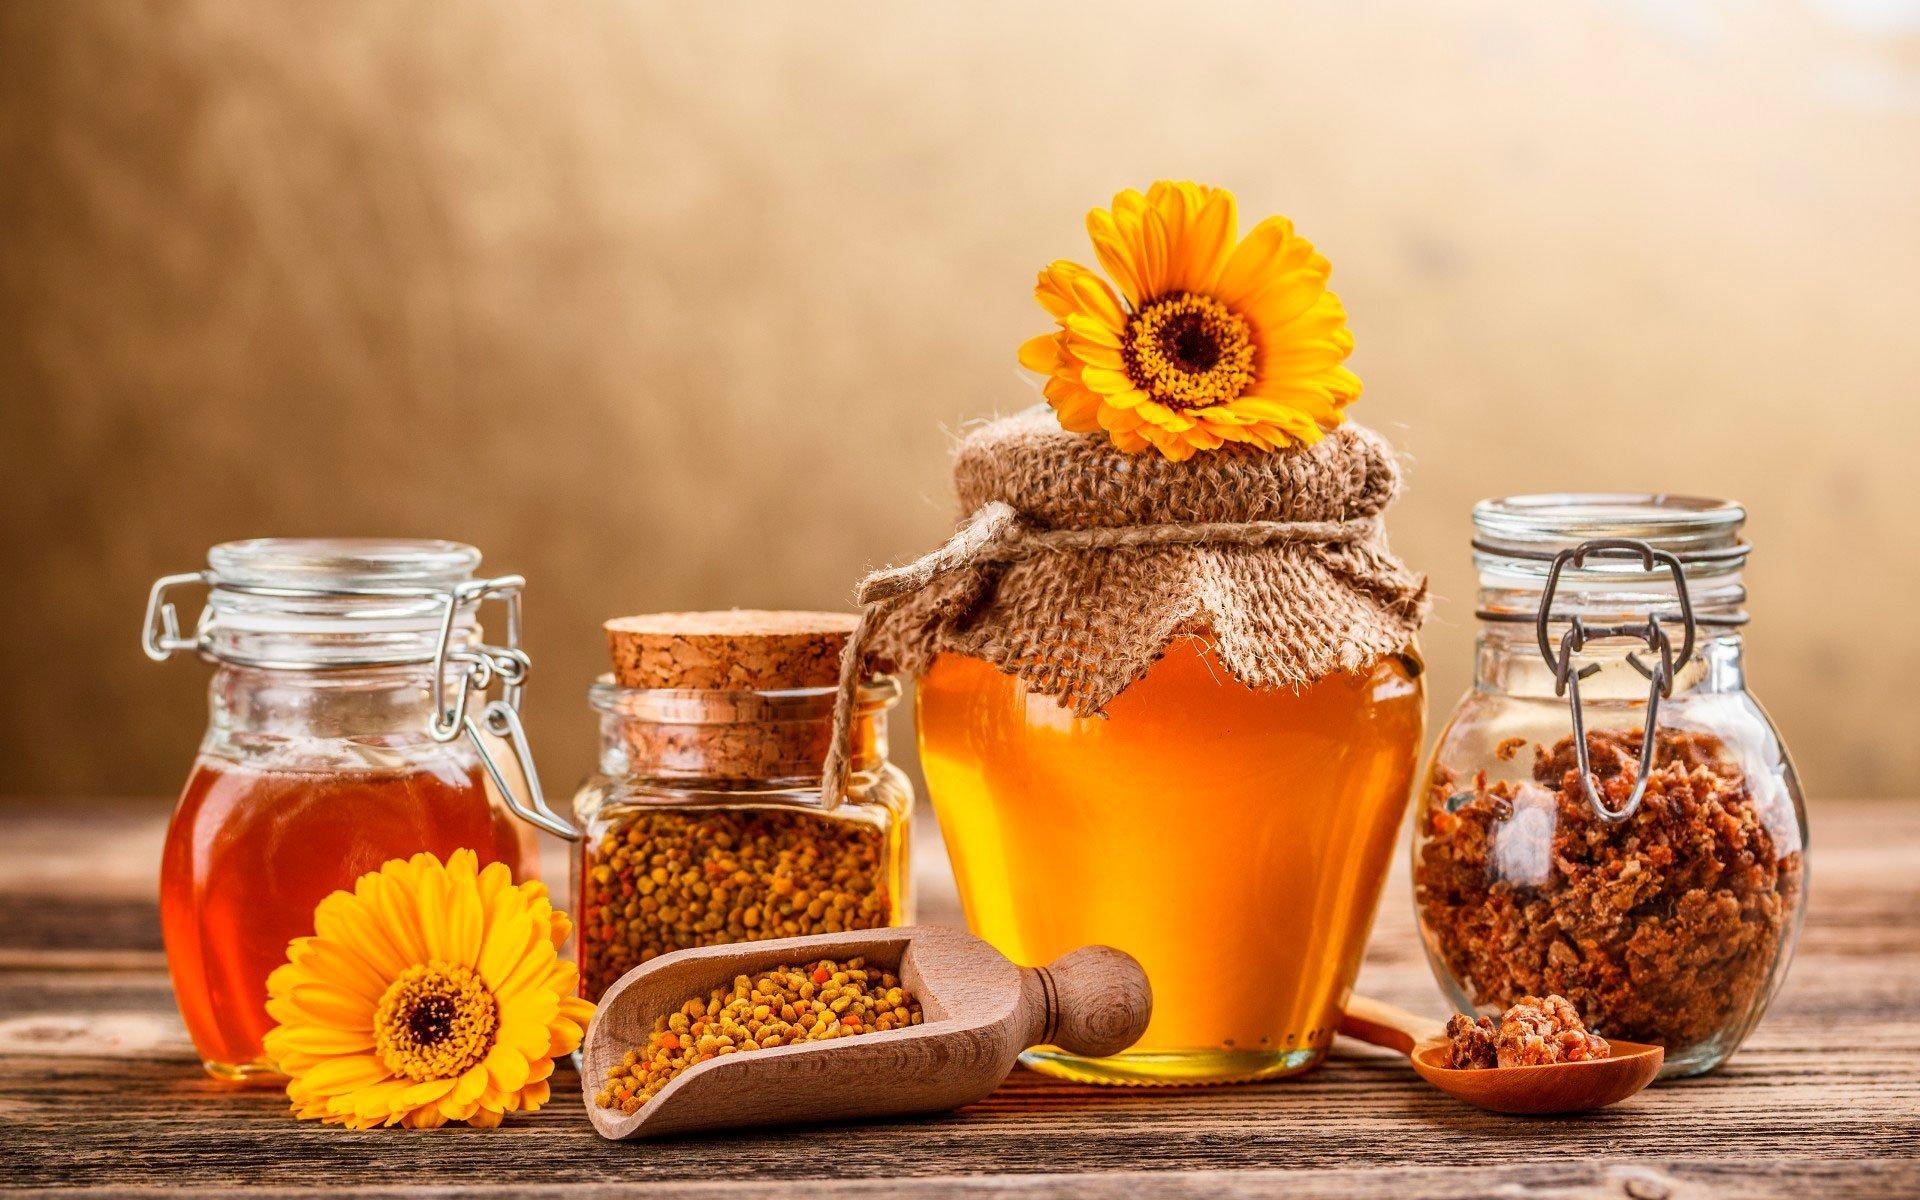 Лечебное применение прополиса и мёда при герпесе